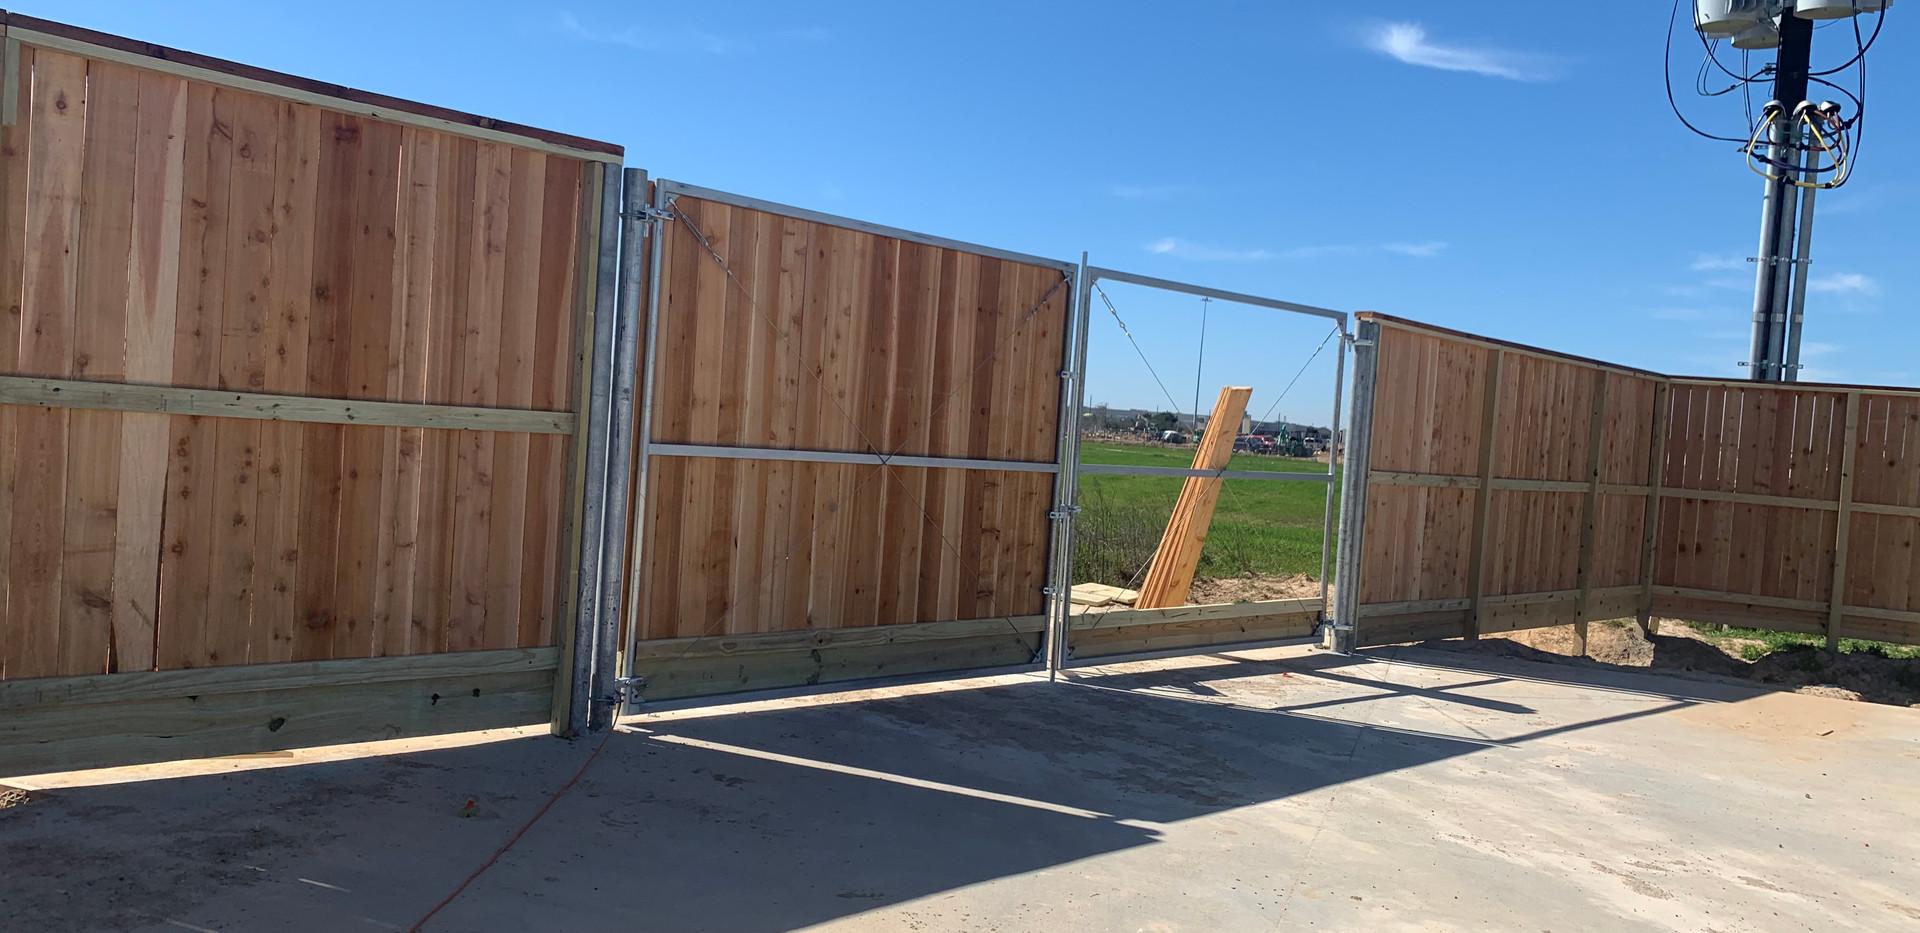 Double Singing Gates with Galvanized Frame